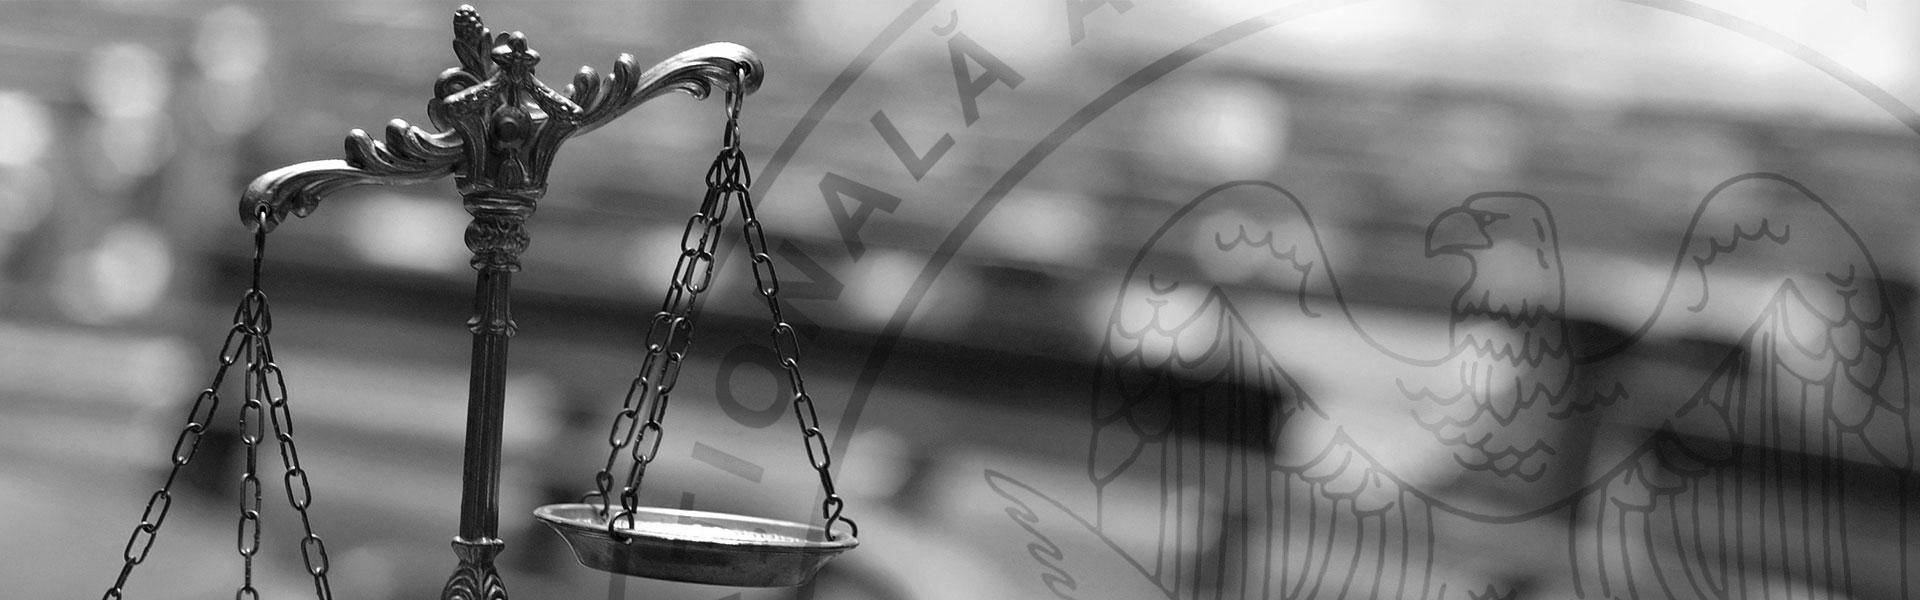 Servicii Juridice - Infiintare Firma